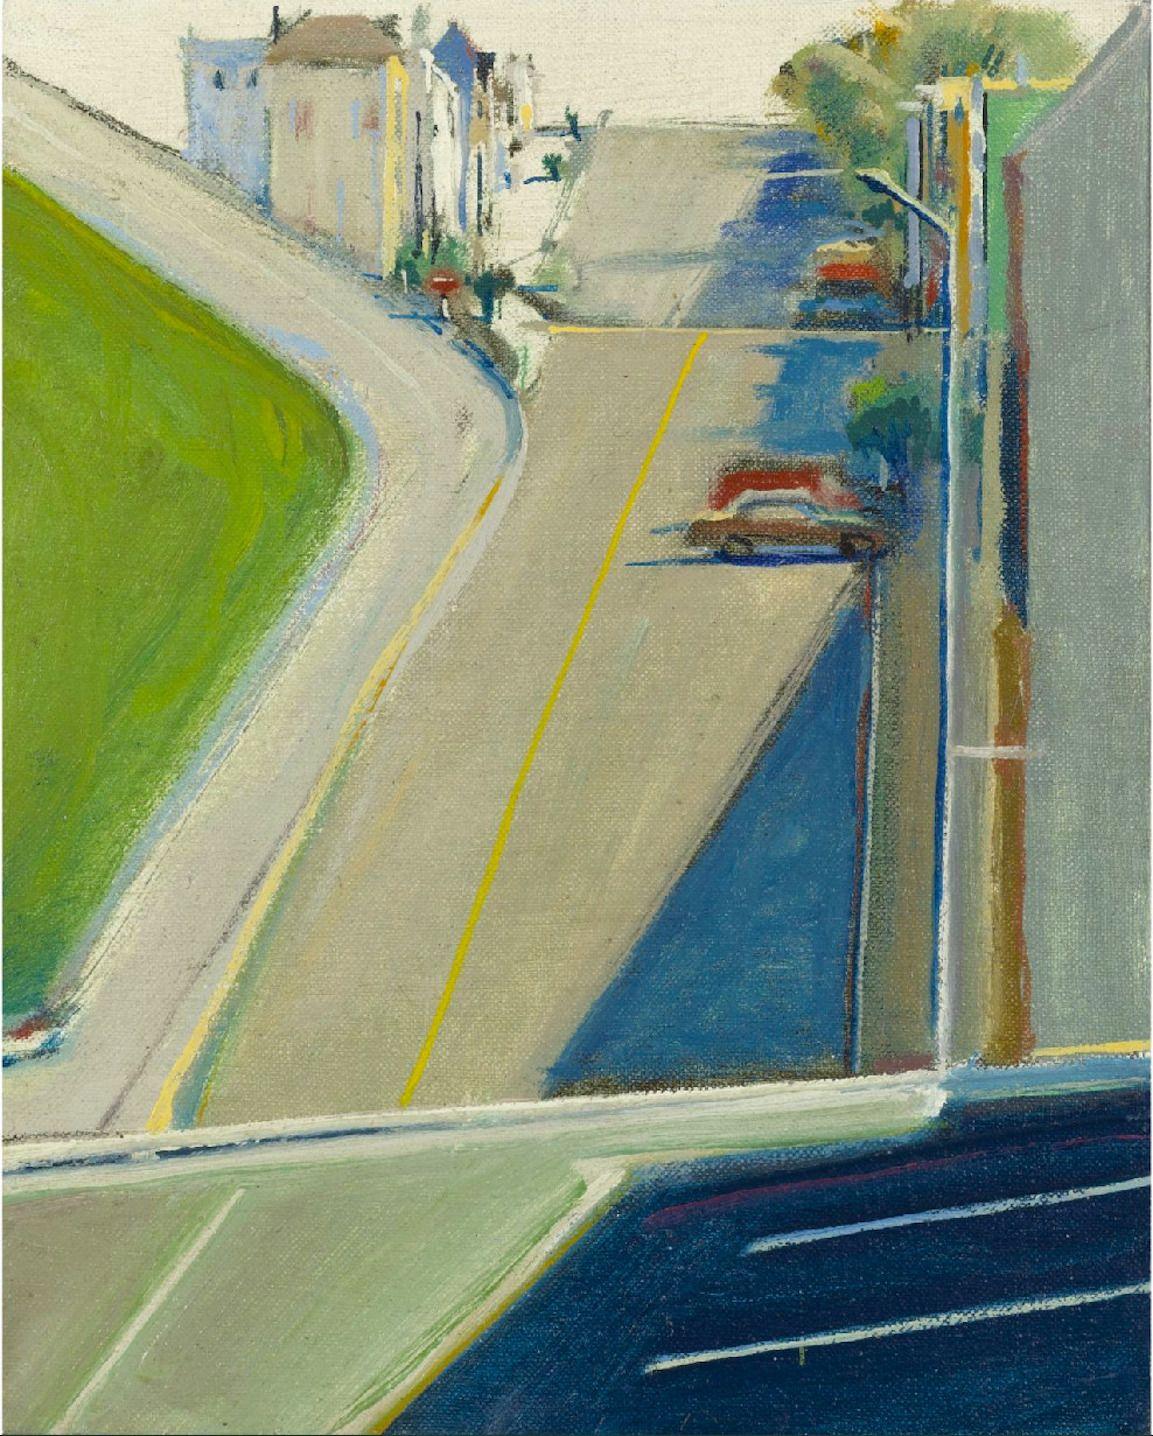 Wayne Thiebaud: Landscape Wayne Thiebaud, Abstract Landscape, Landscape  Paintings, Abstract Art, - Wayne Thiebaud: Landscape City, Town, Village In 2018 Pinterest